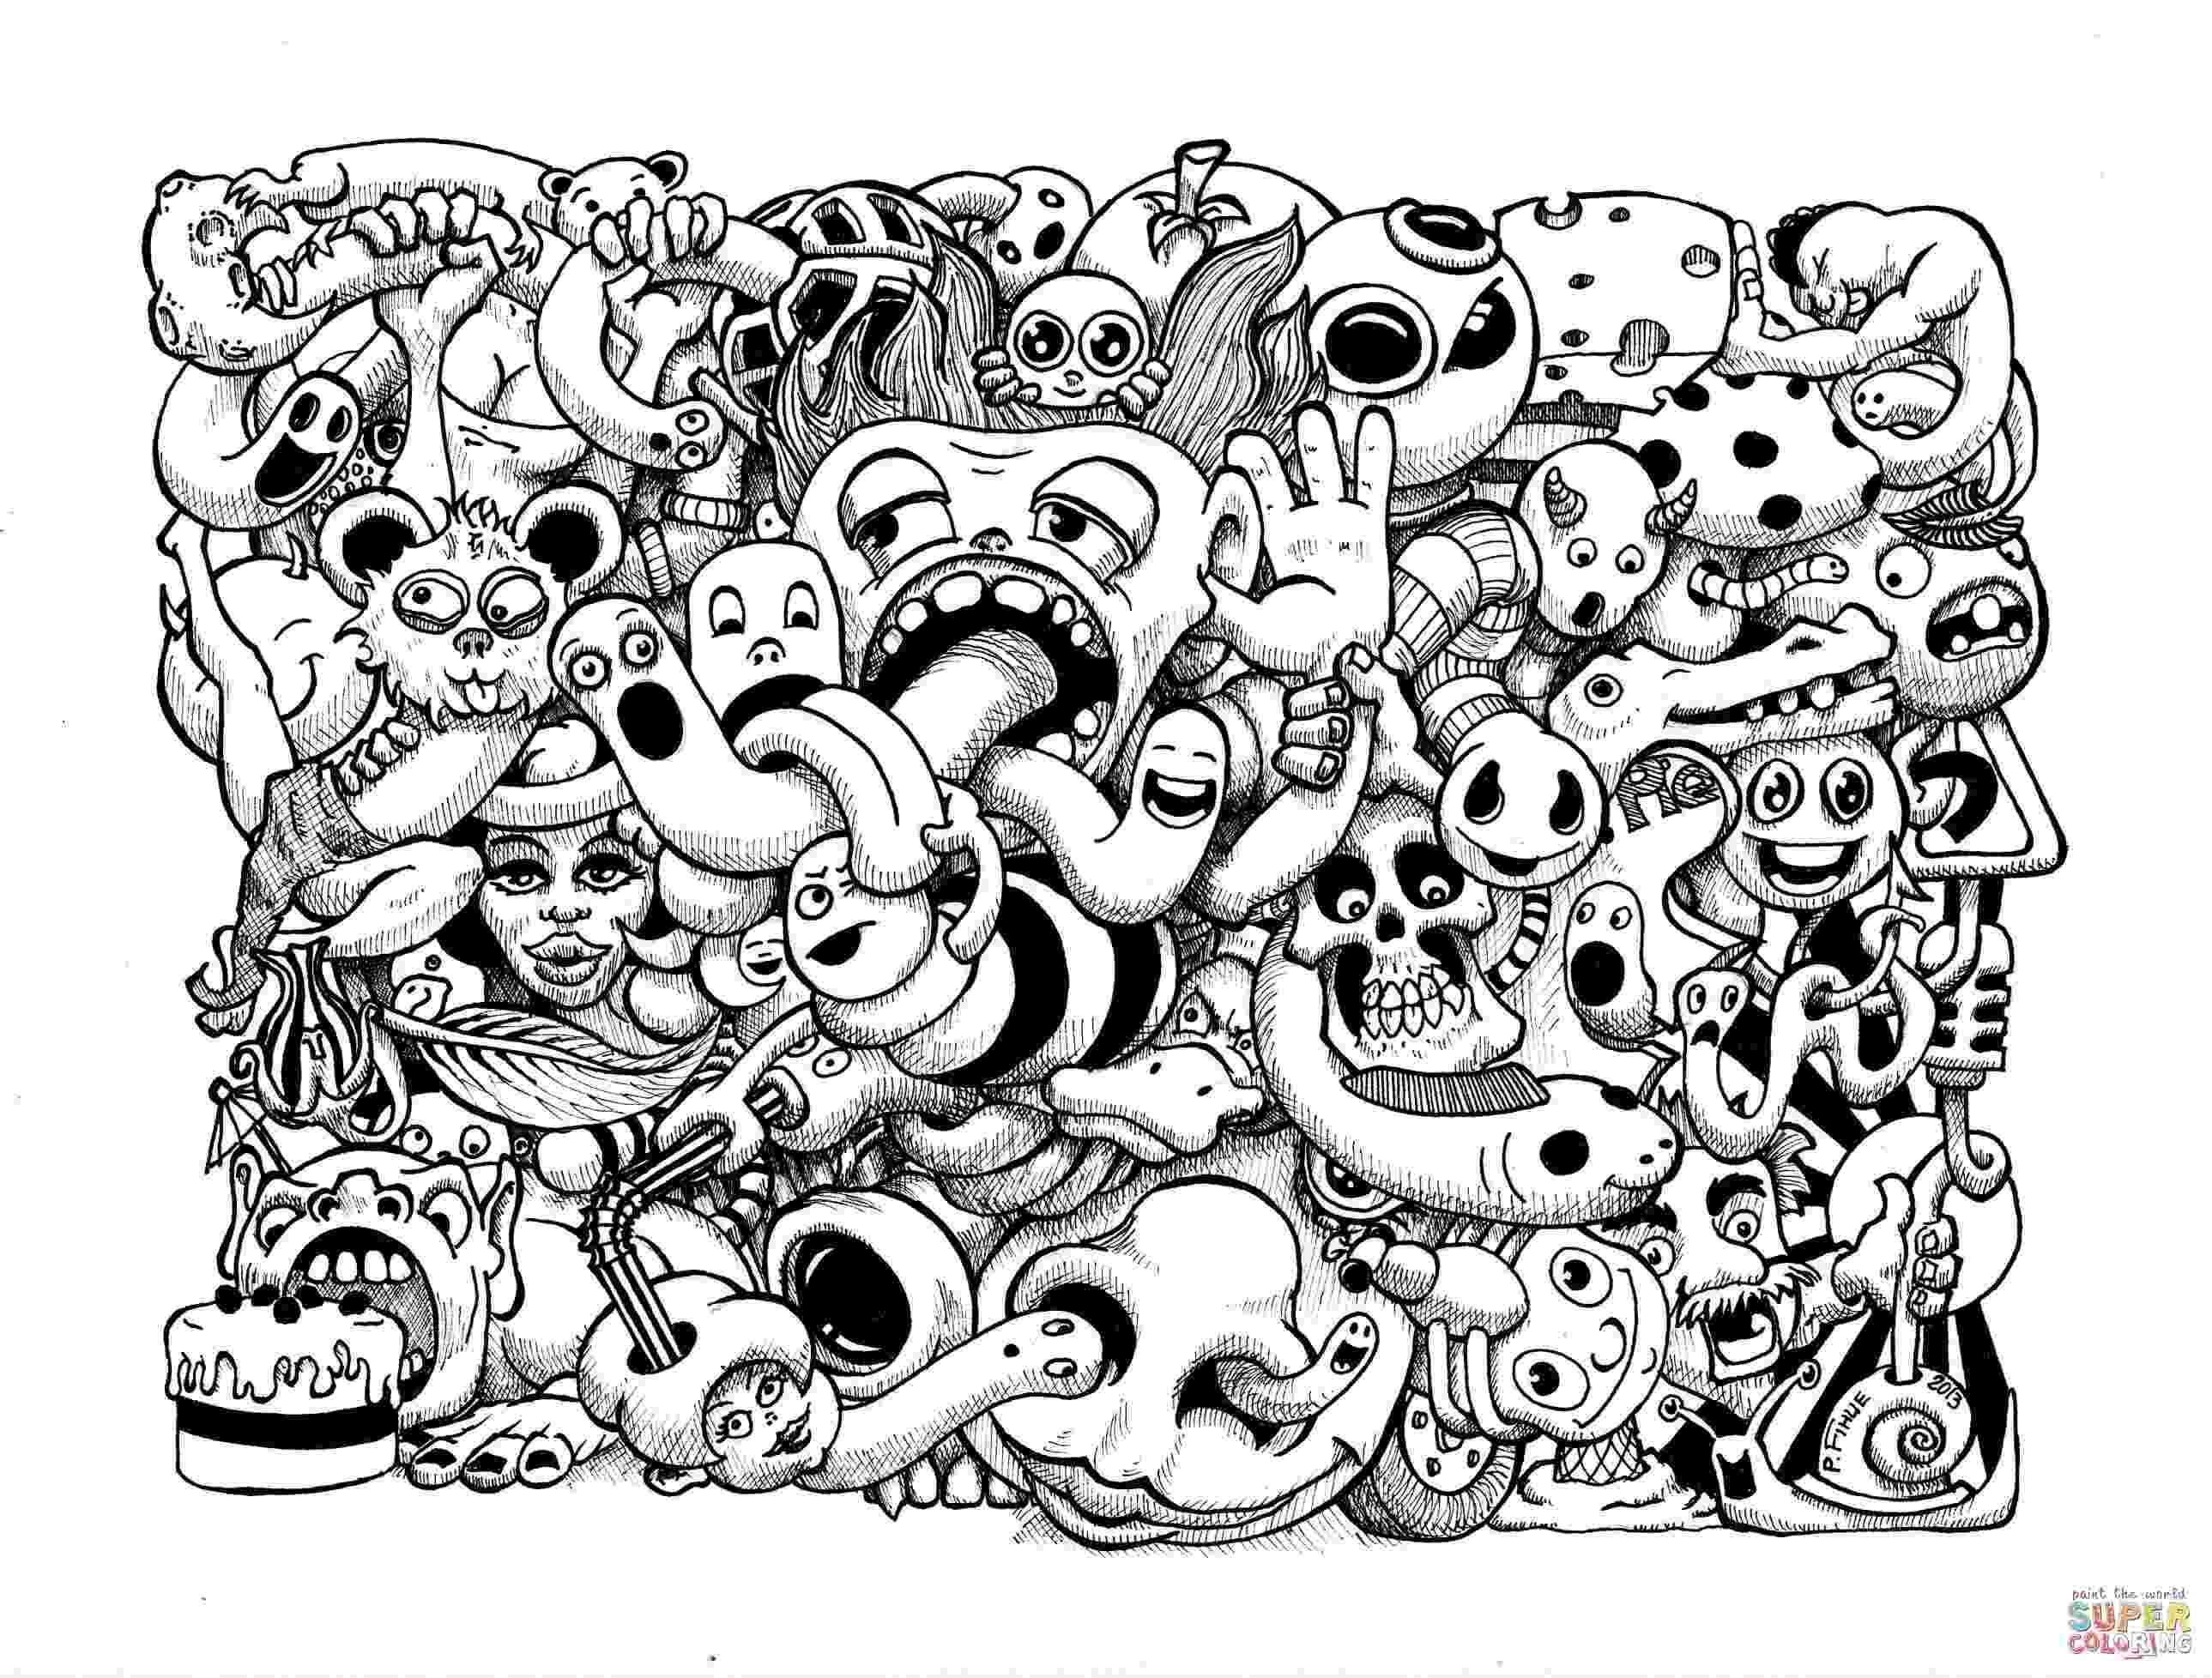 doodle art free printables doodle art to color for children doodle art kids doodle printables free art